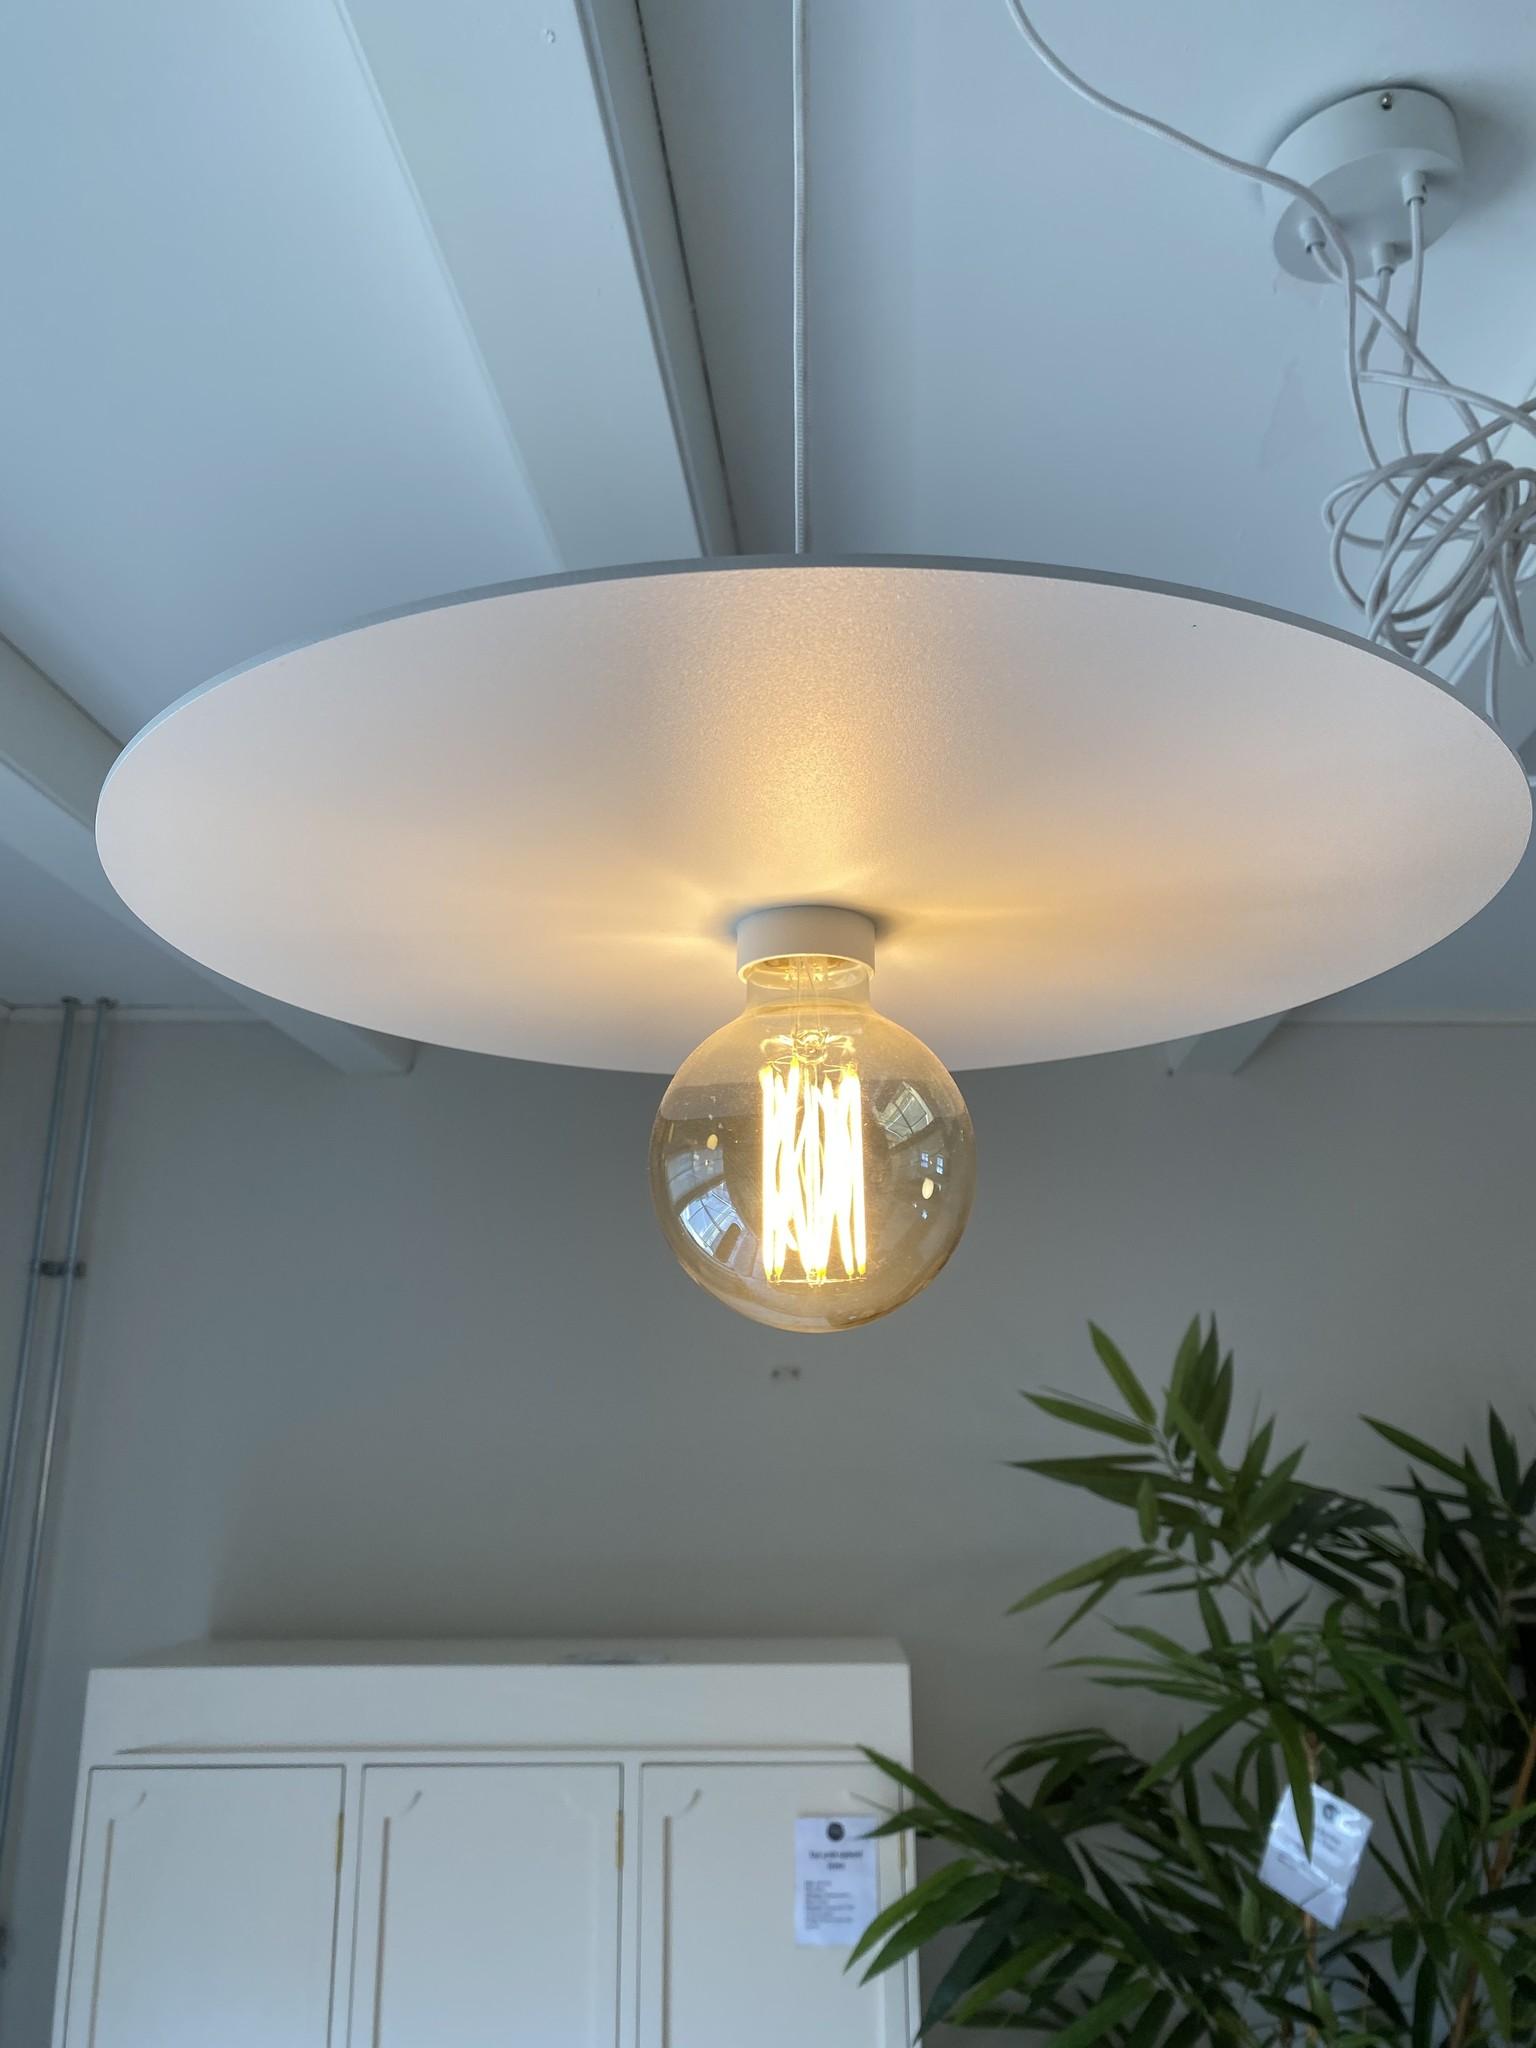 Hanglamp Nod Pendant XL-3